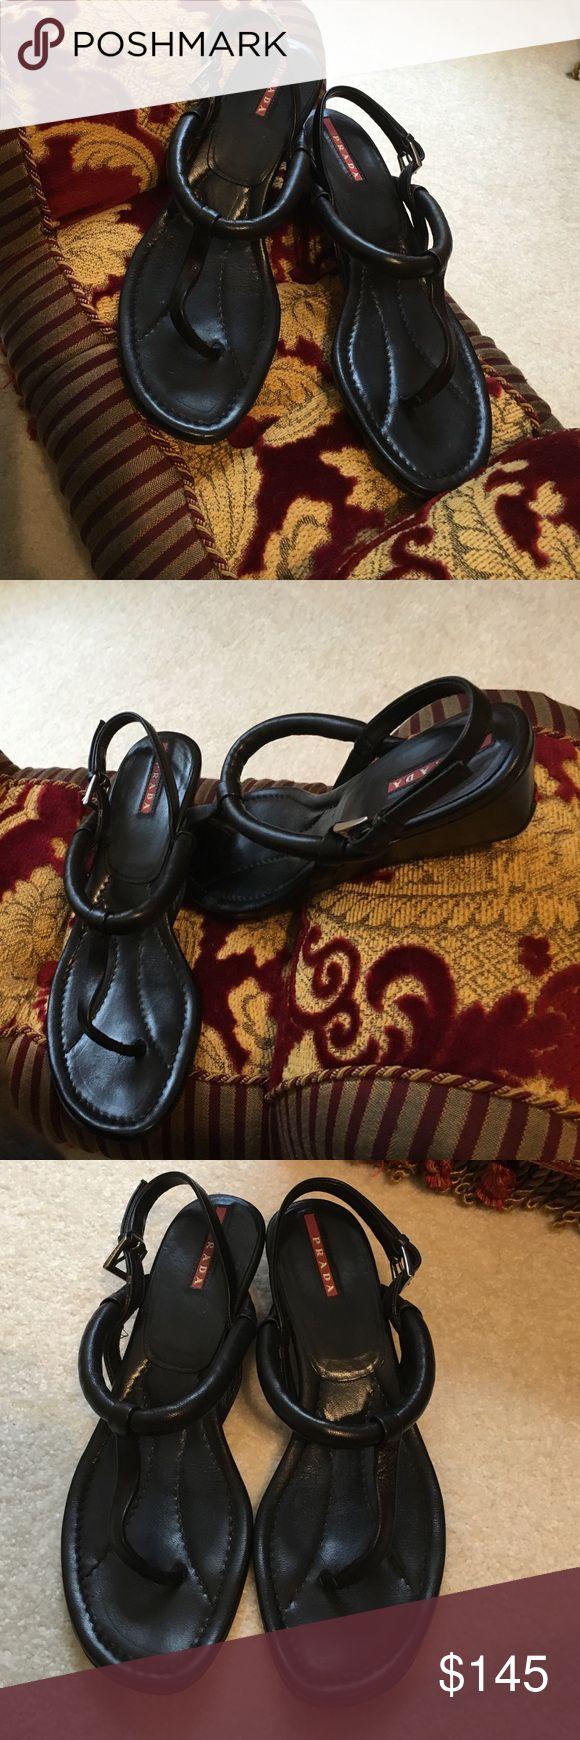 Prada Wedges Timeless Prada Linea Rosa black wedges! Extreme comfort, worn twice, excellent condition! Prada Linea Rossa Shoes Wedges